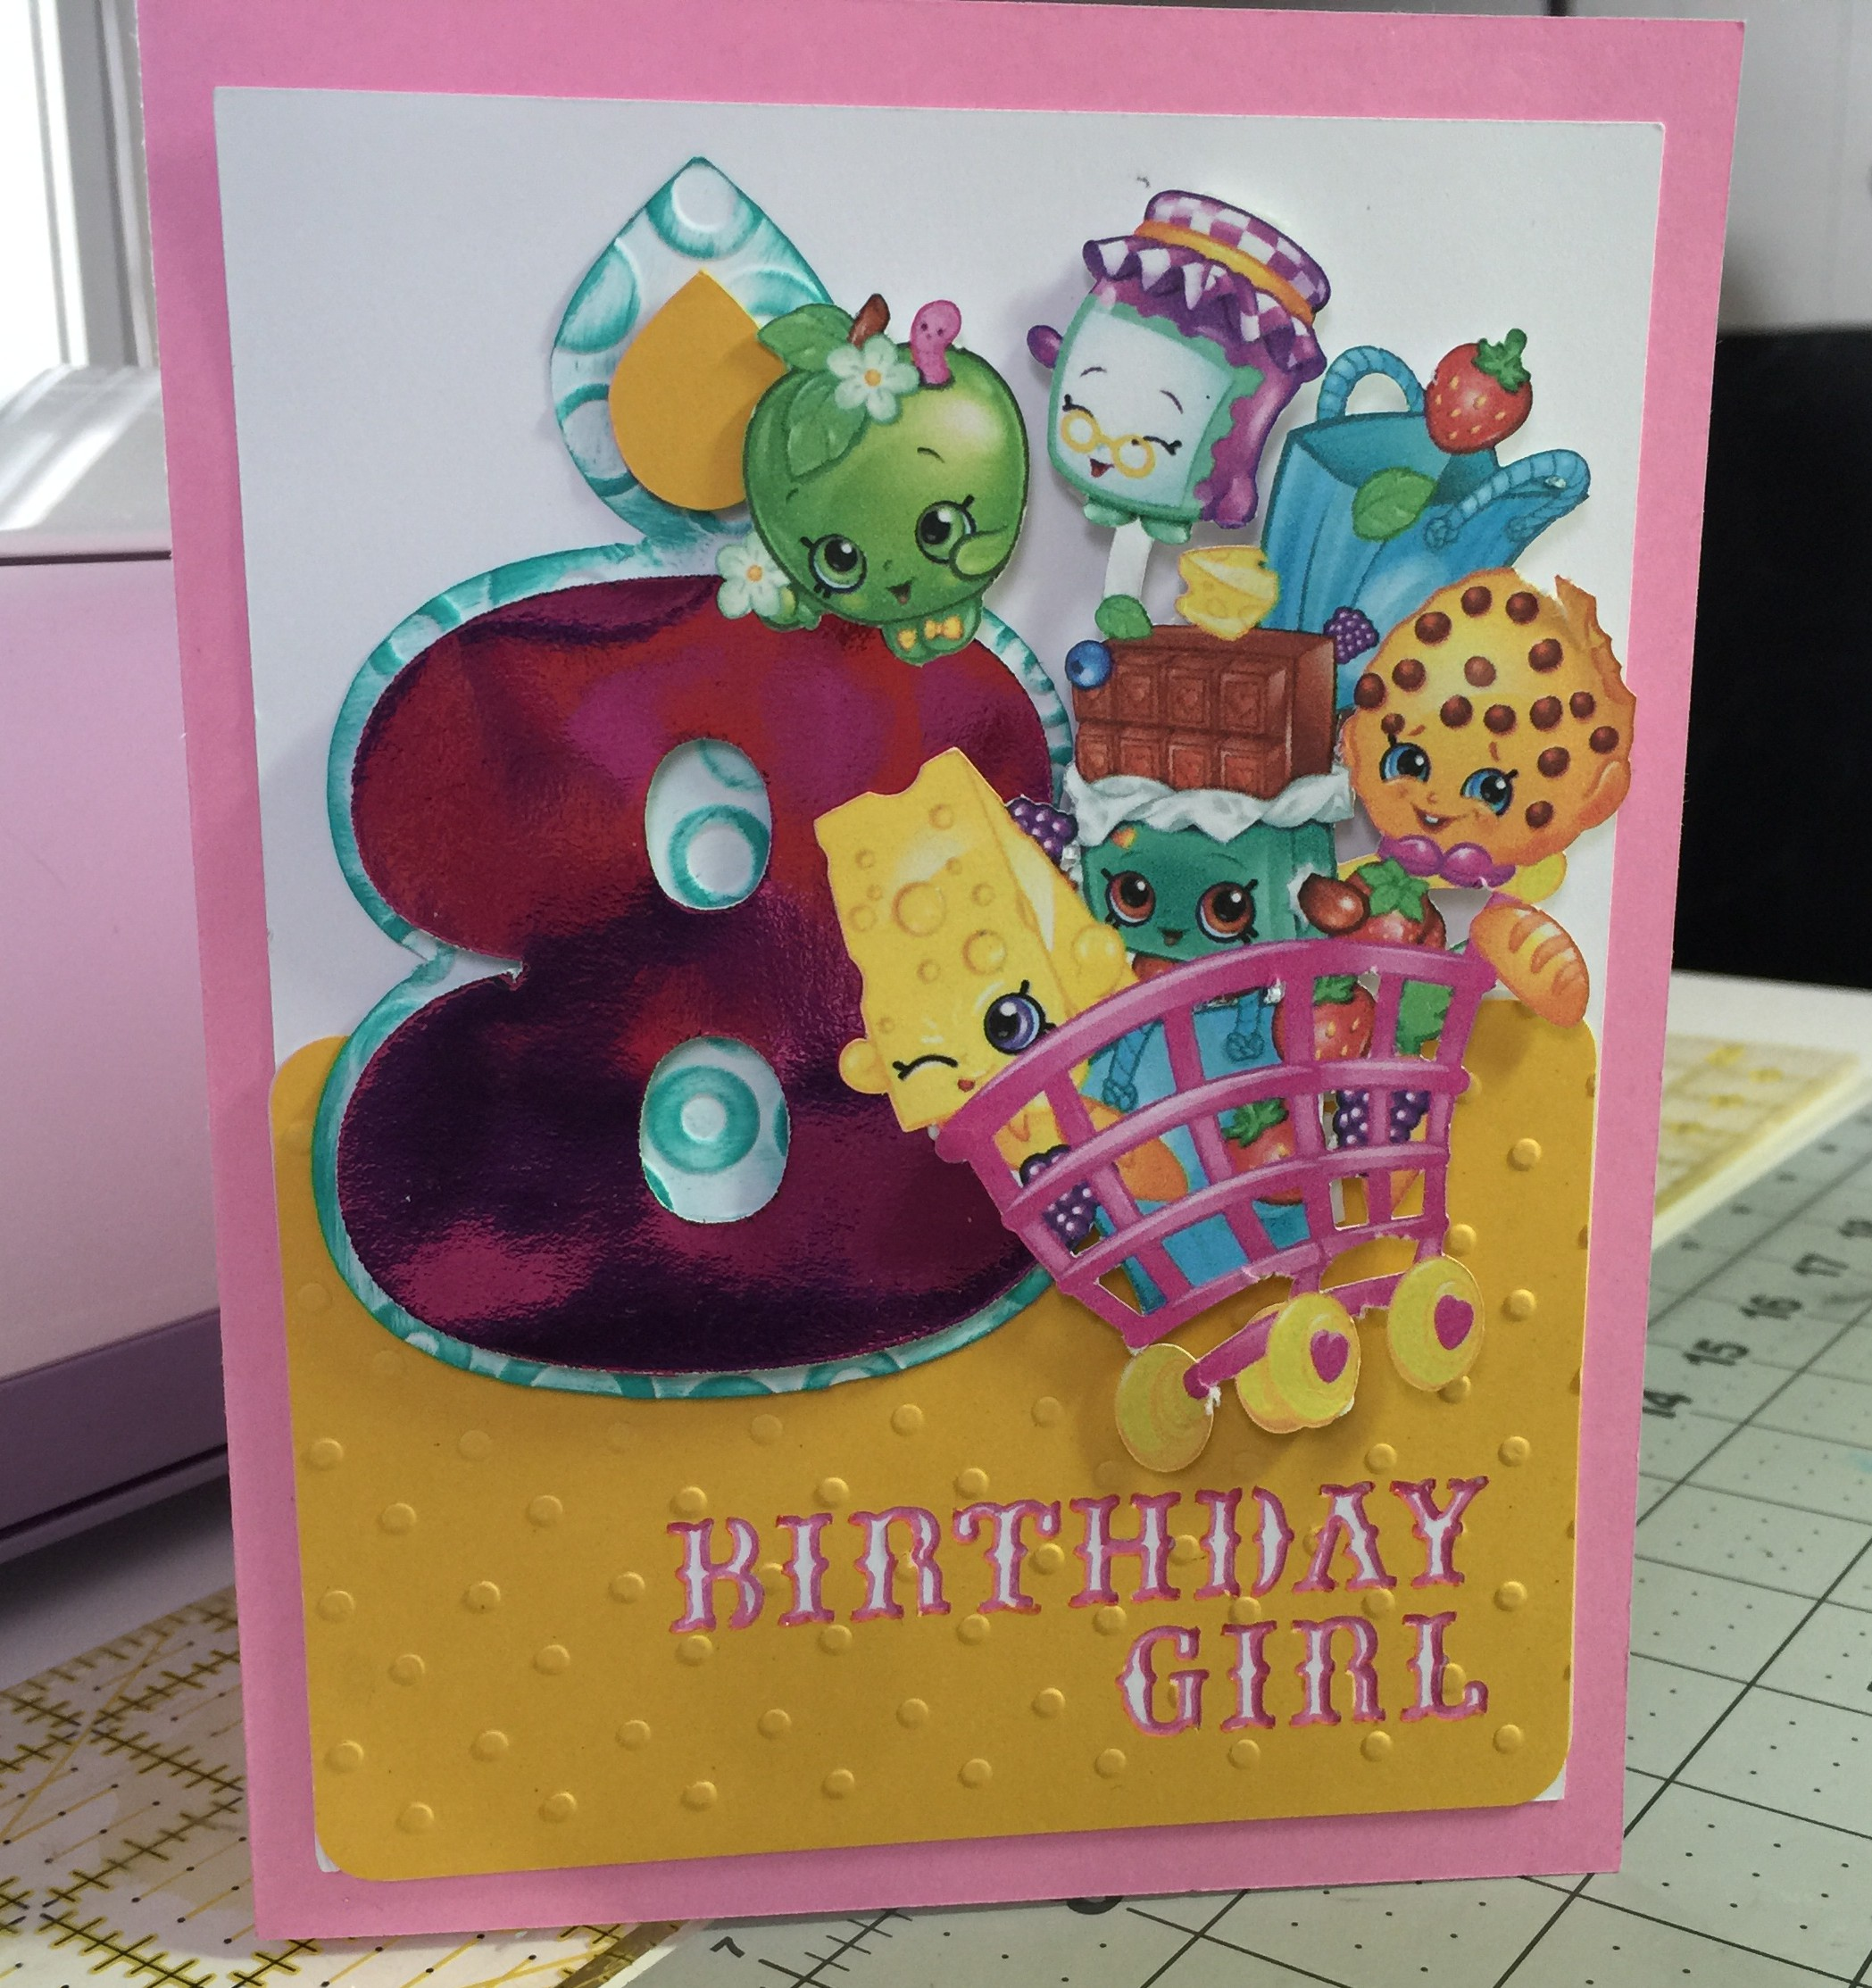 photograph regarding Shopkins Birthday Card Printable known as Shopkins Birthday Print Then Slice Card Cathy Crafts